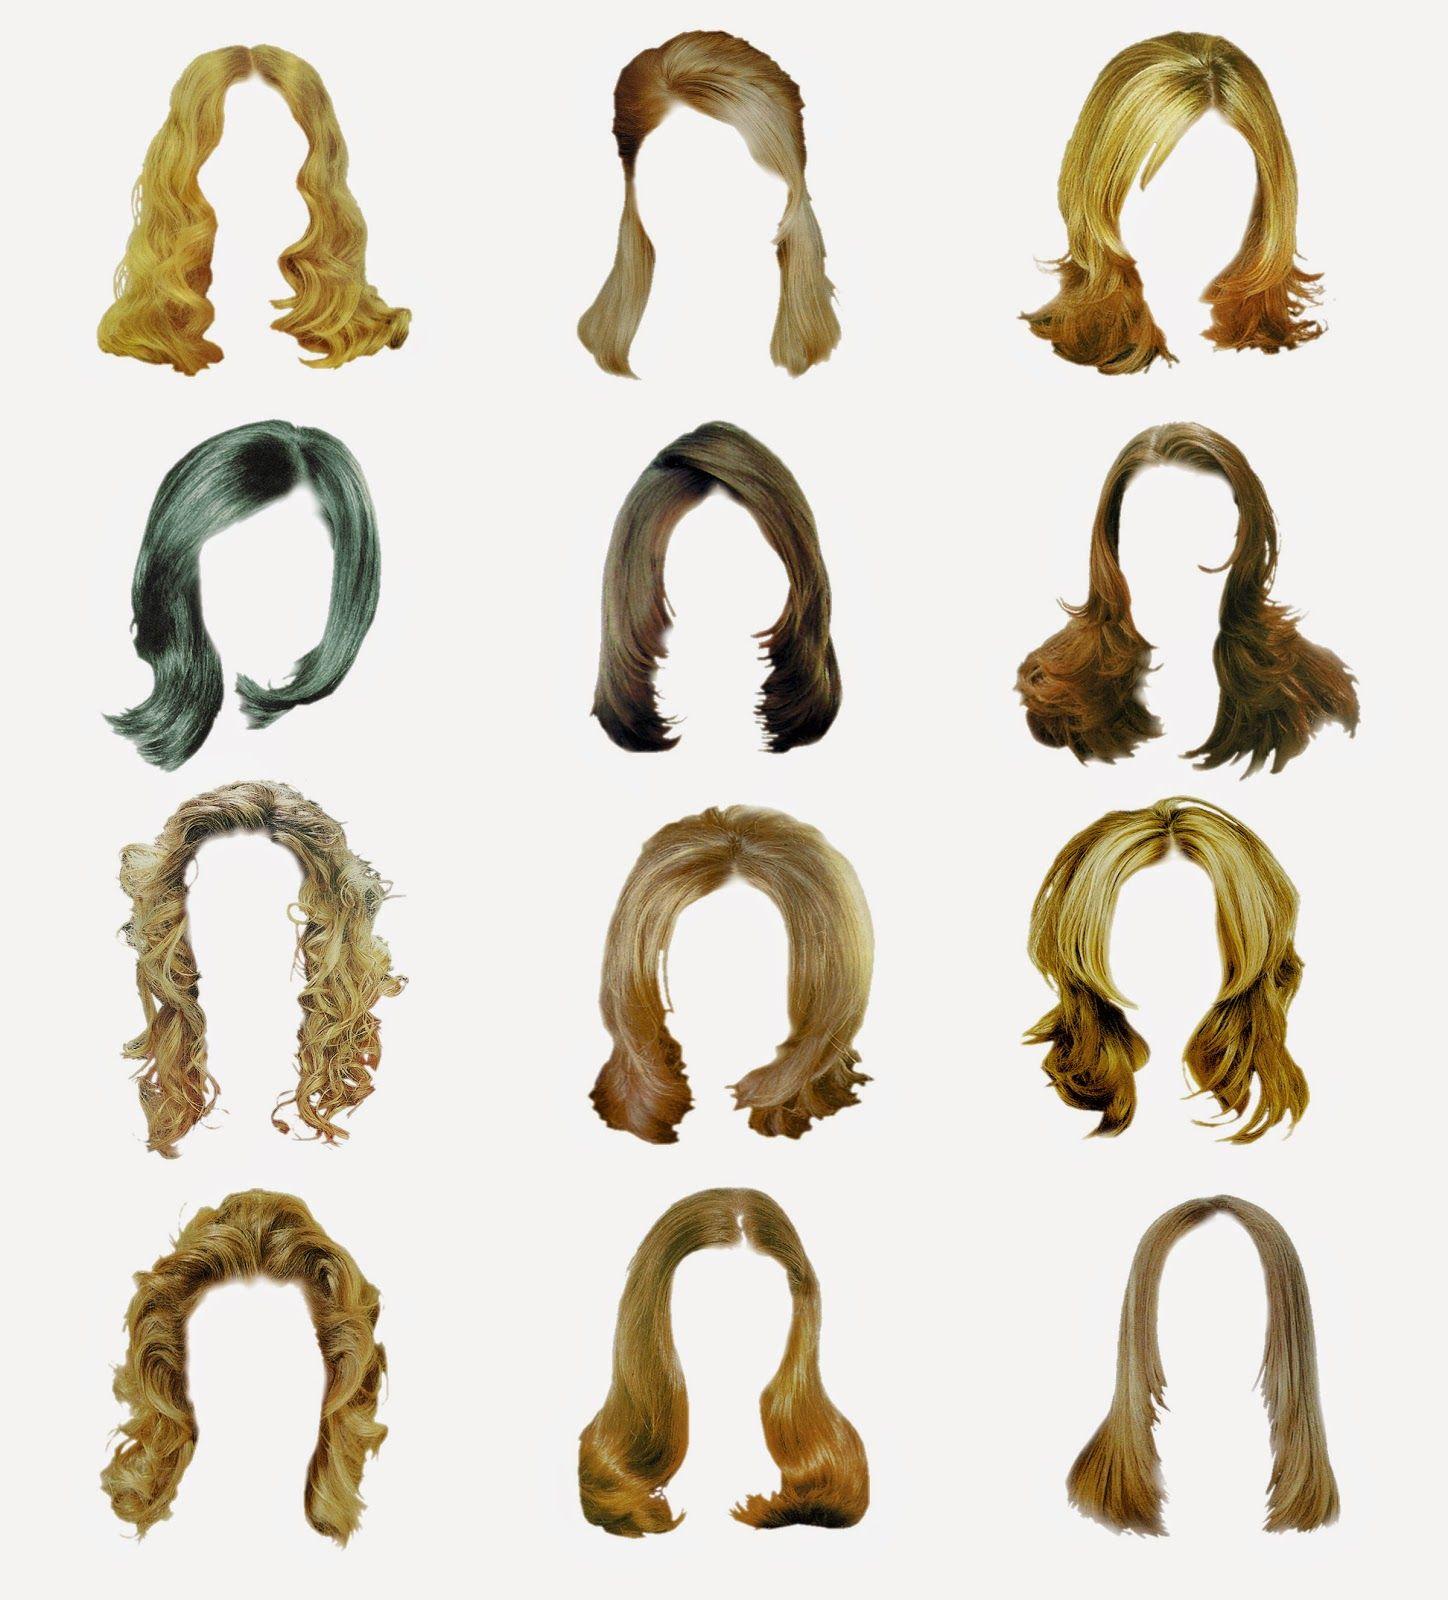 12 Women Hair Style Psd In File Lucky Studio 4U Baderu